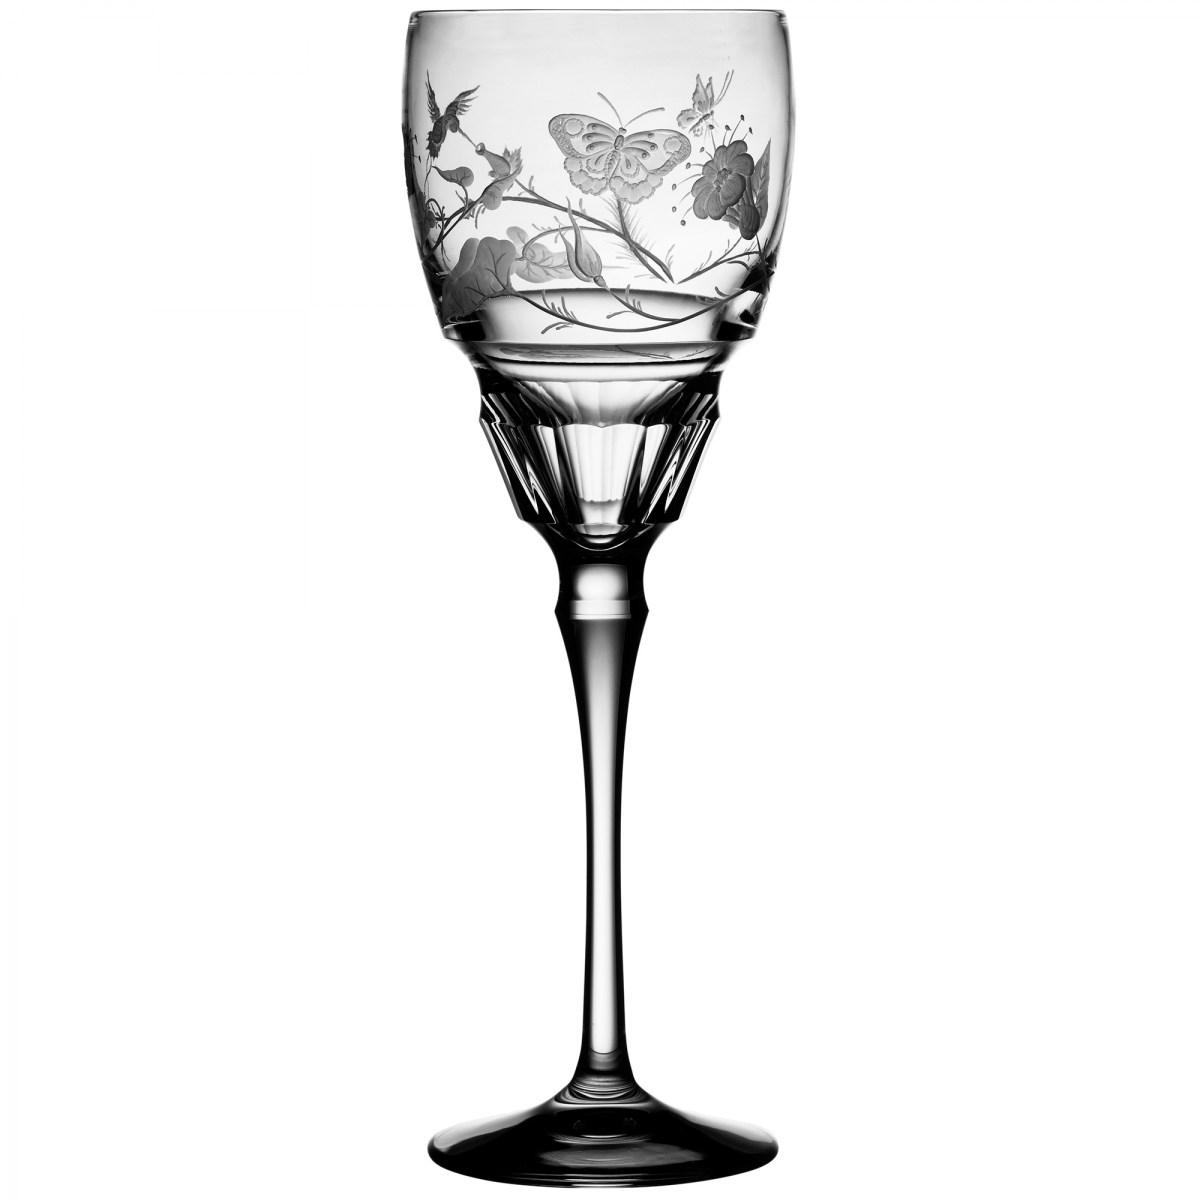 Marbella Clear Water - $ 203 / € 178